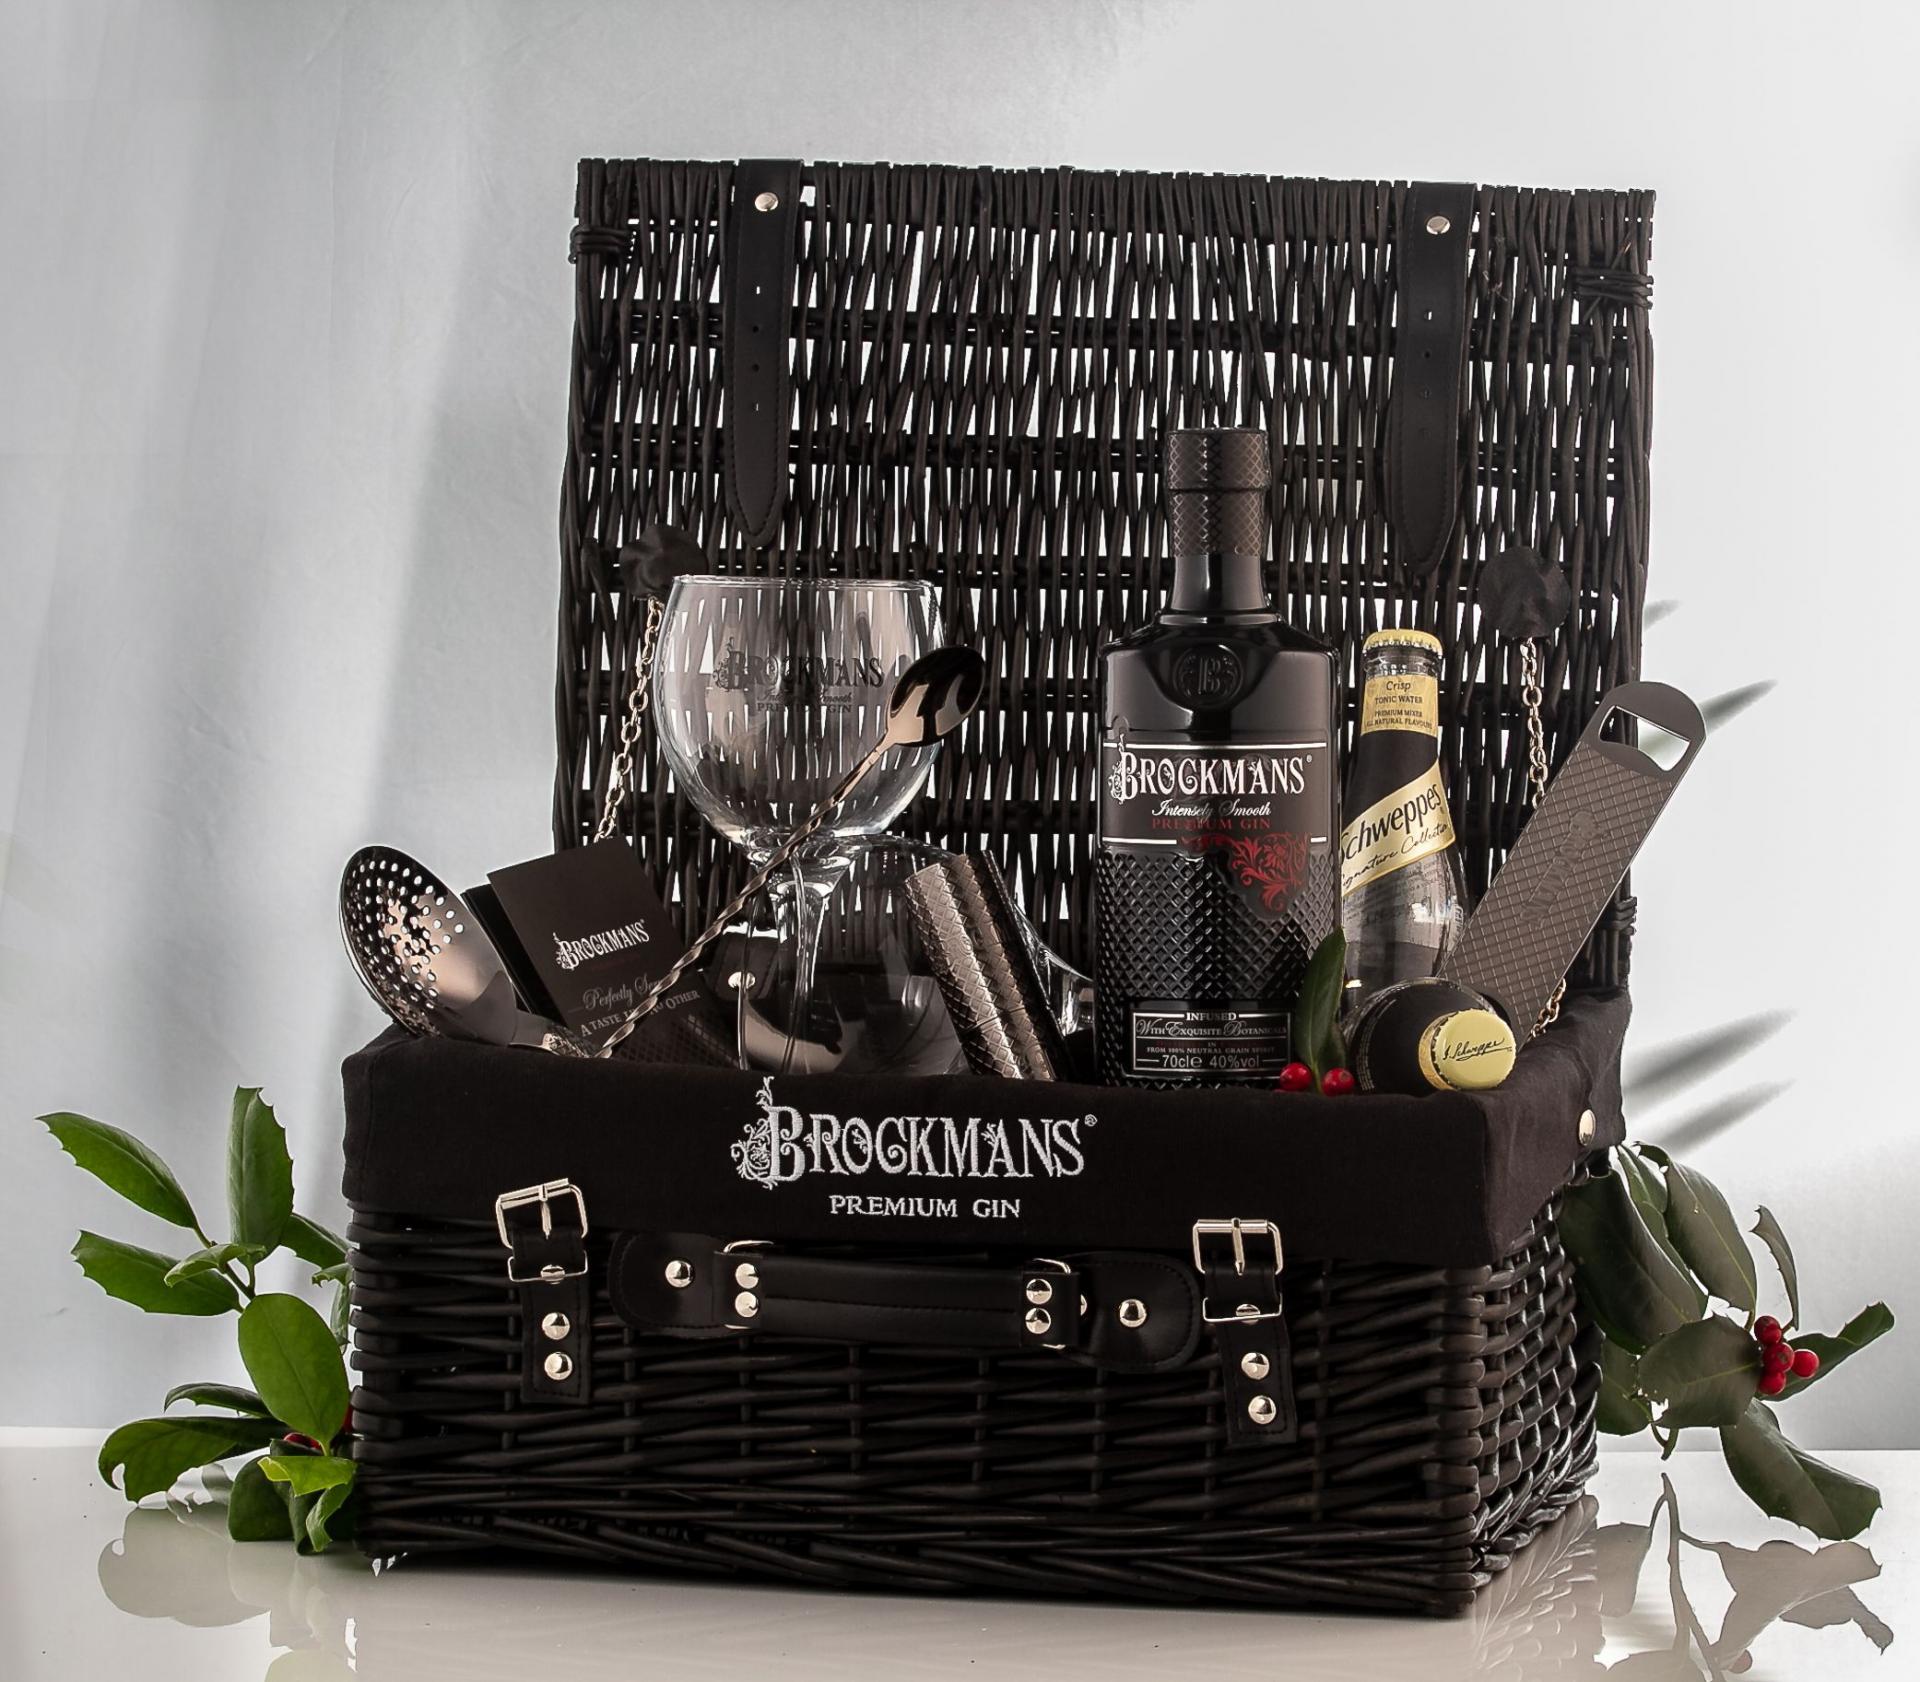 Brockmans Gin Christmas hamper